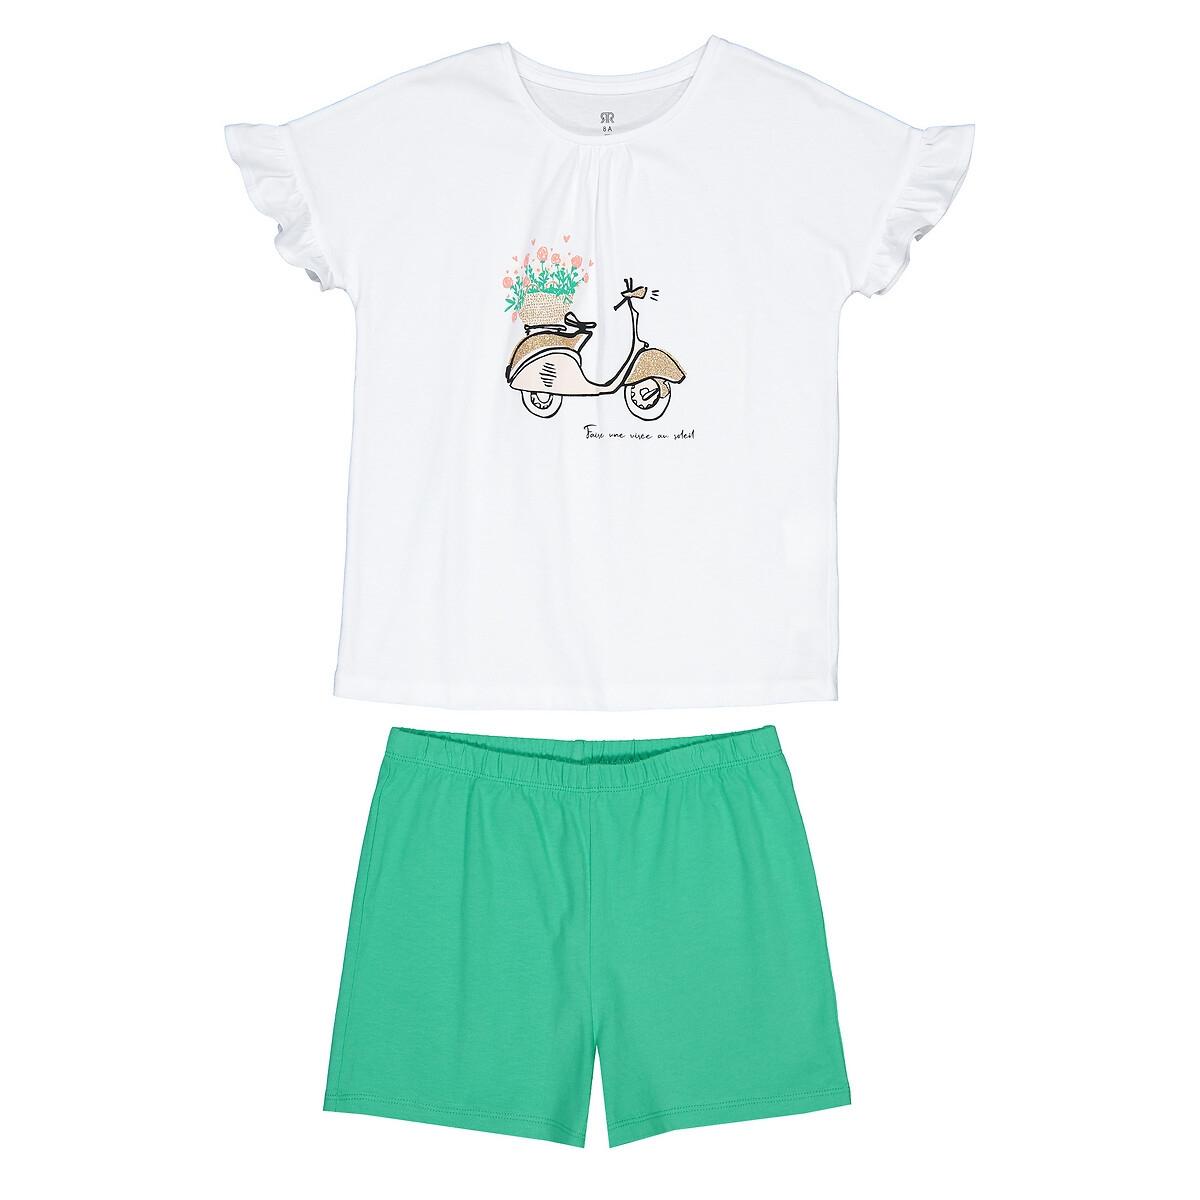 Пижама LaRedoute Из биохлопка 3-12 лет 4 года - 102 см белый